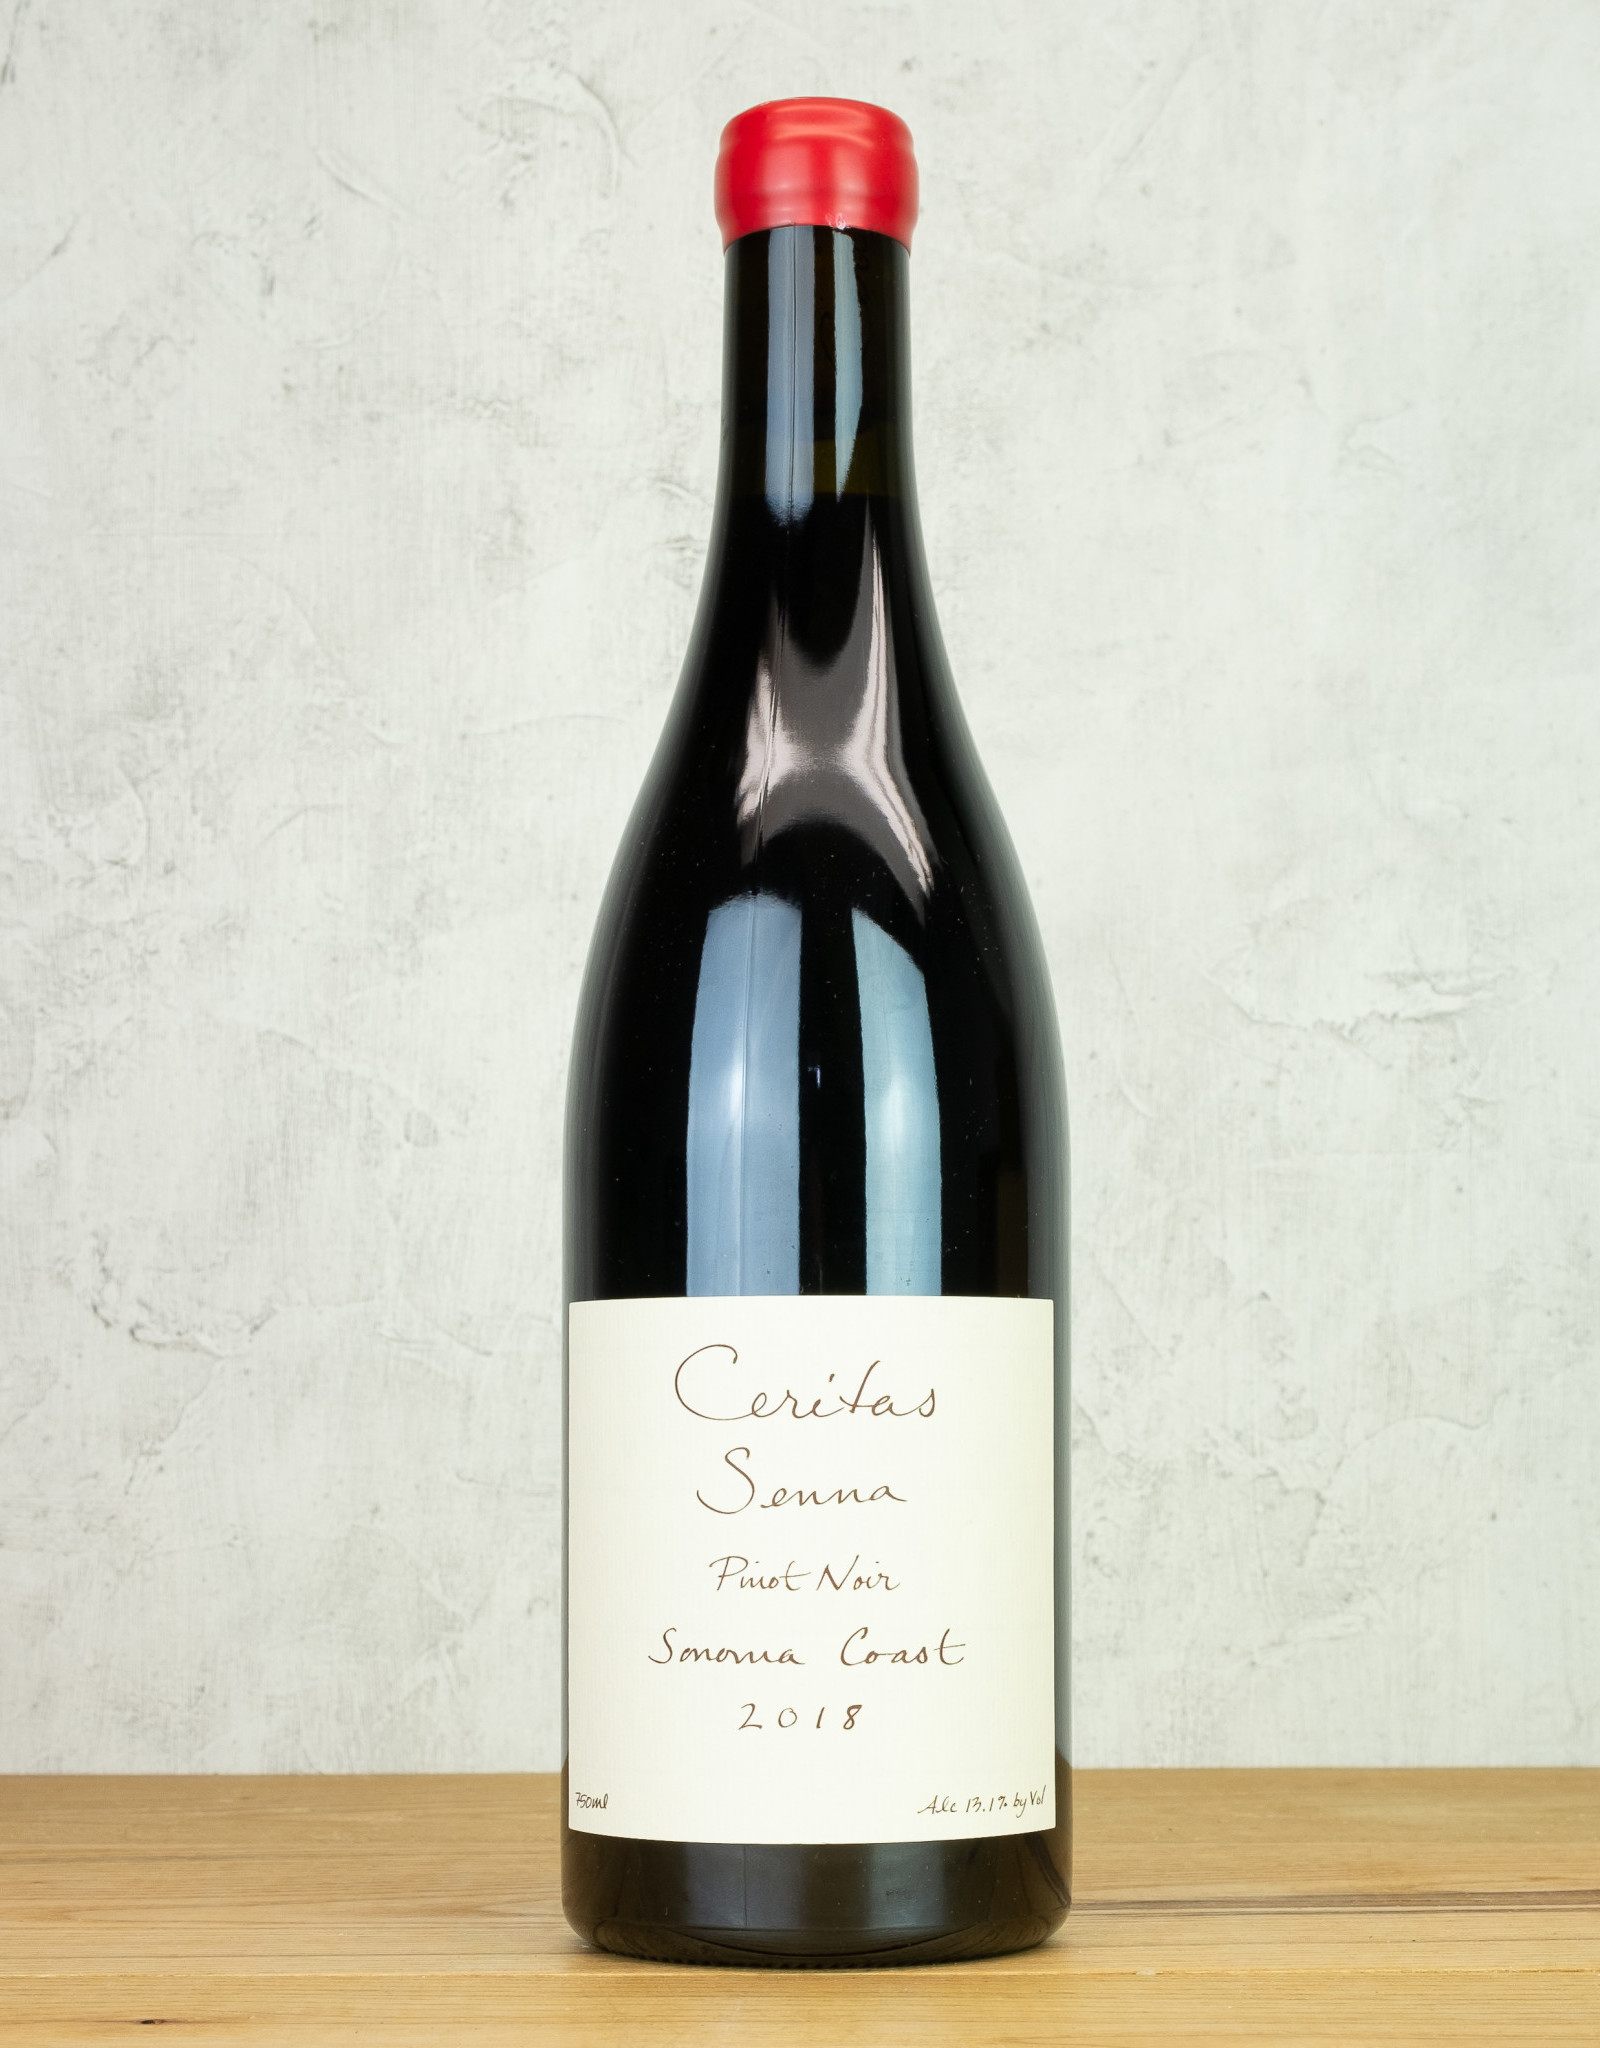 Ceritas Senna Pinot Noir